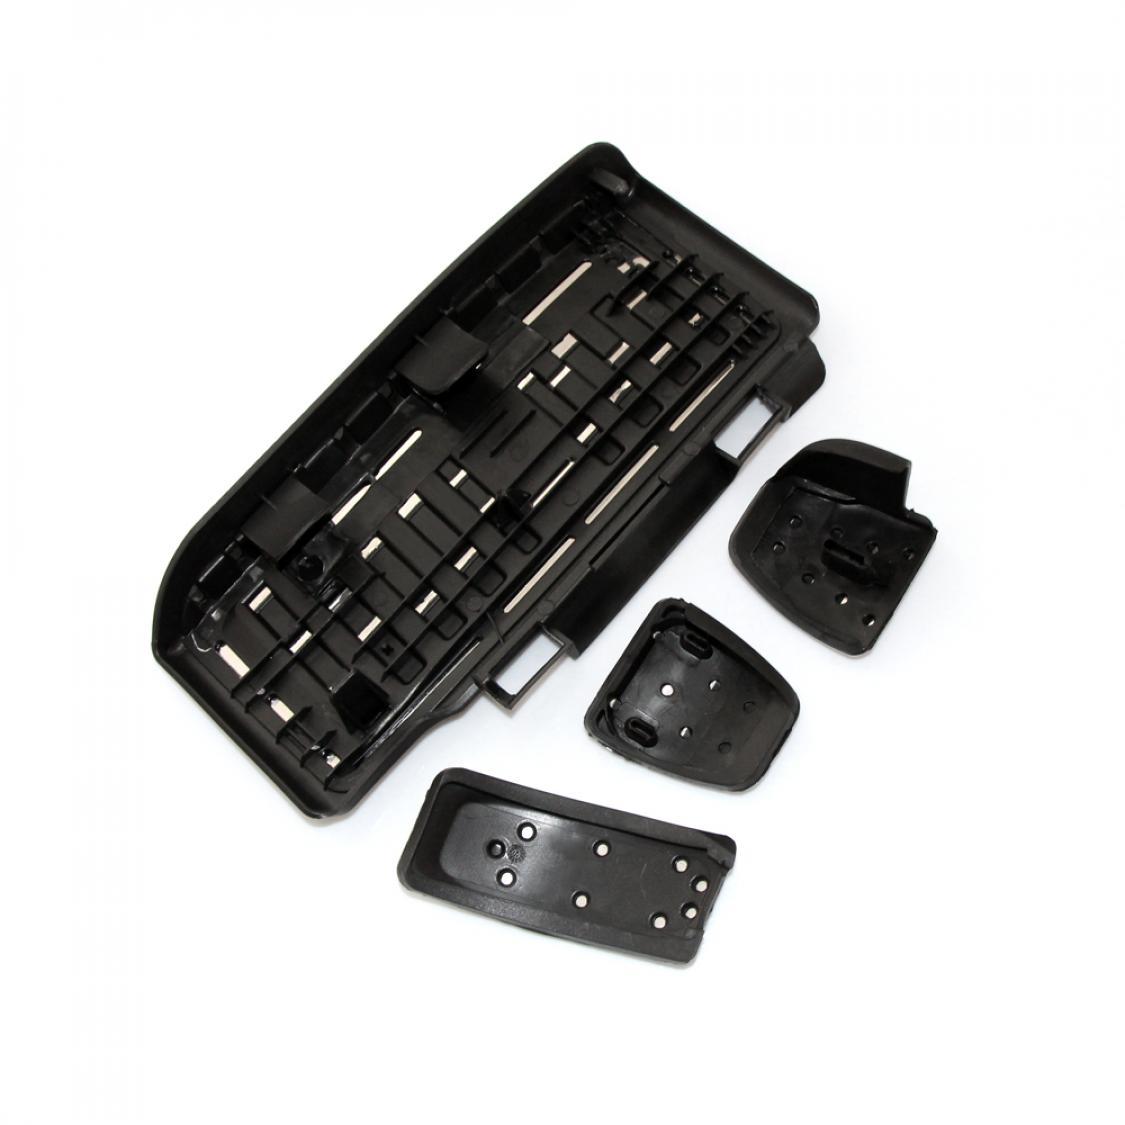 pedal pedale pedalkappen pedalgummi passend f r vw golf 7 gti gtd r line manuel eur 31 49. Black Bedroom Furniture Sets. Home Design Ideas